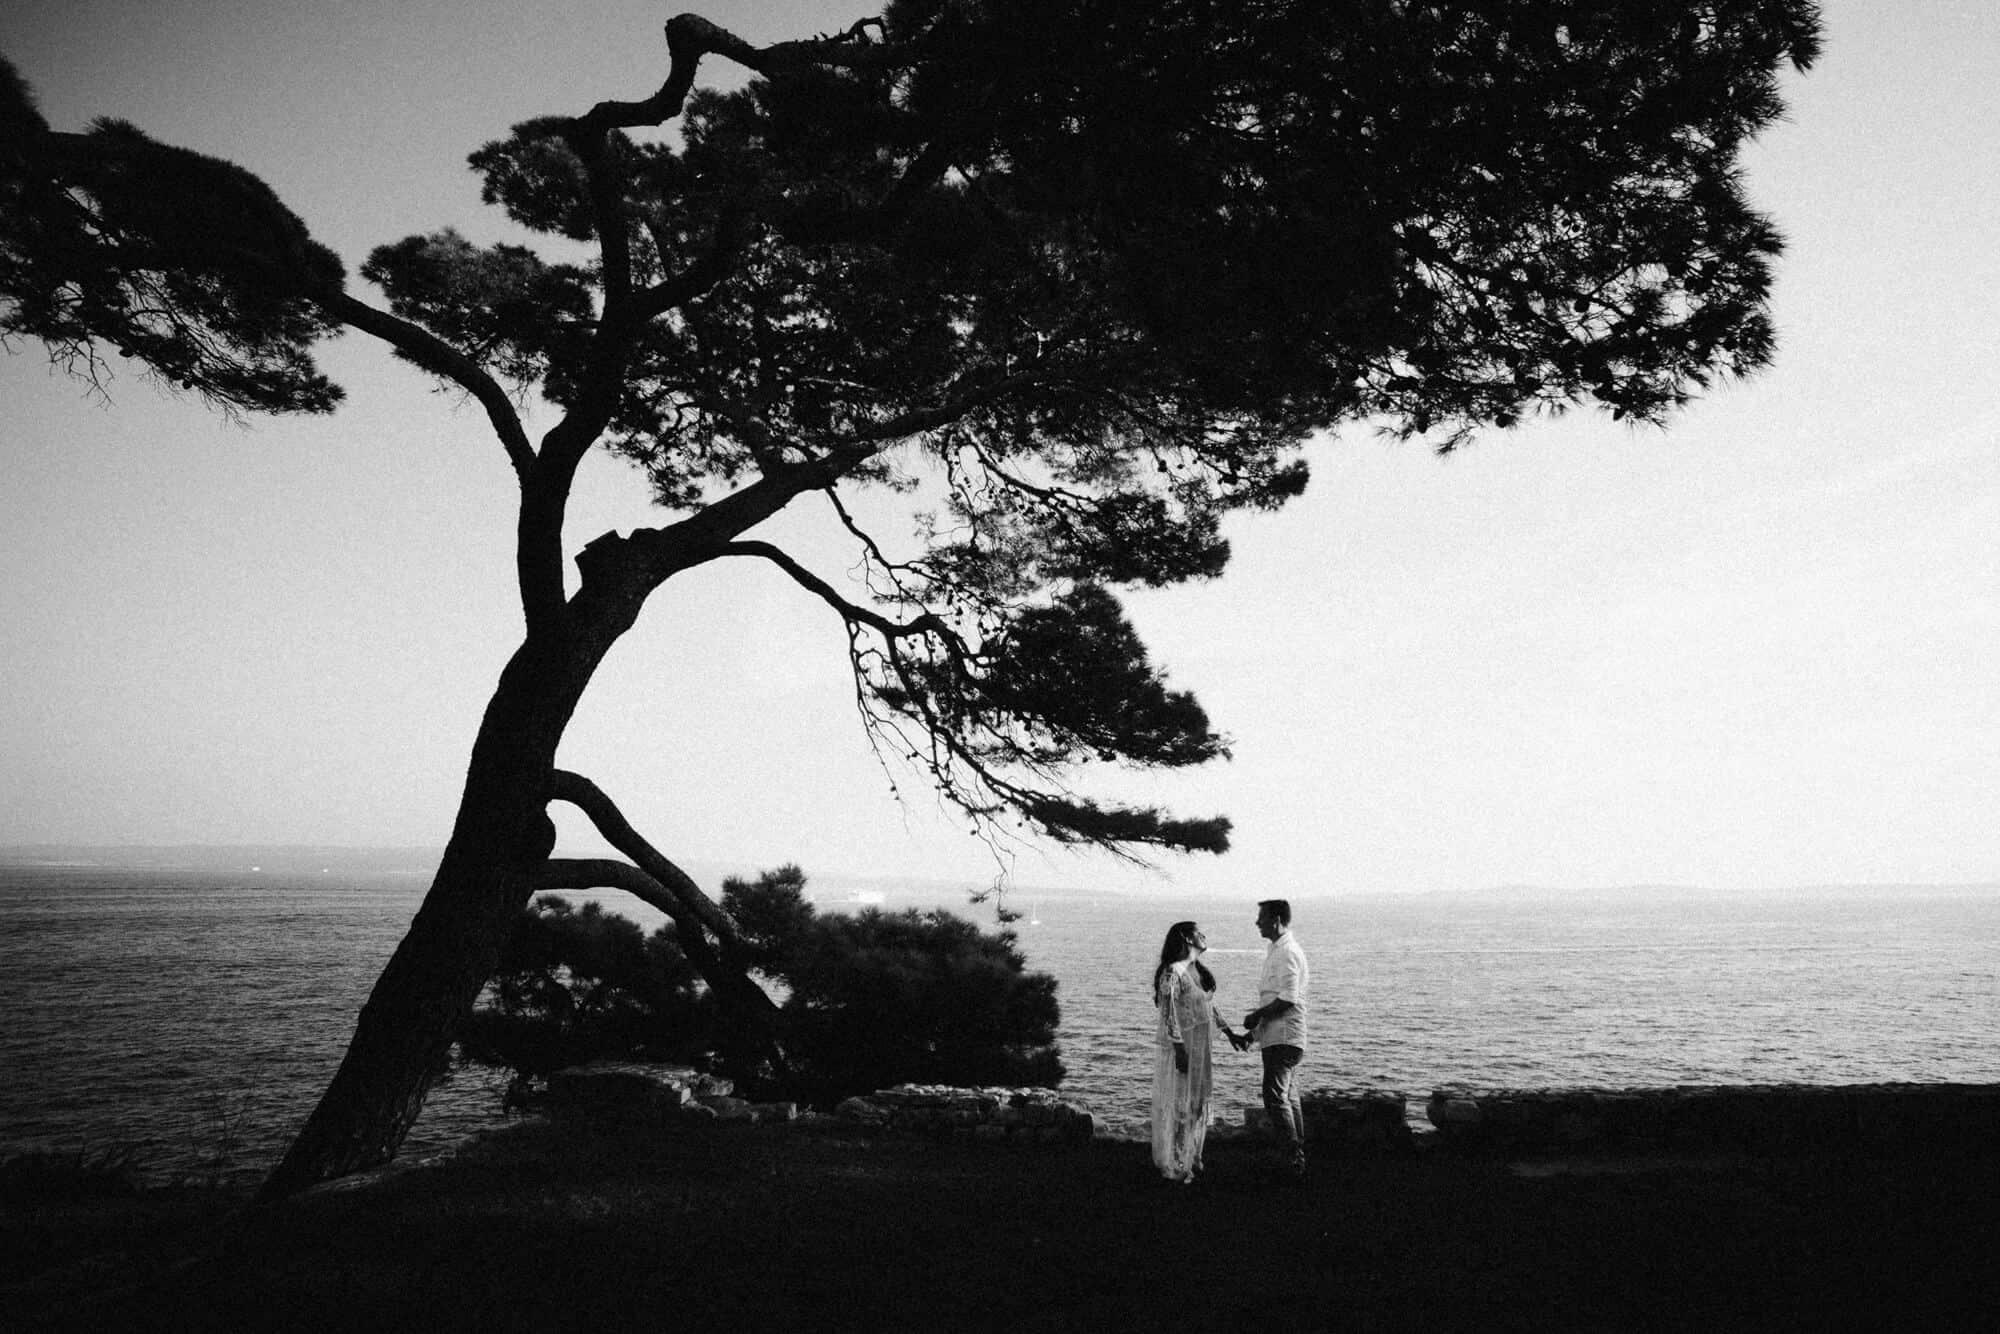 Croatia Elopement Love and Ventures 26 | Croatia Elopement Photographer and Videographer